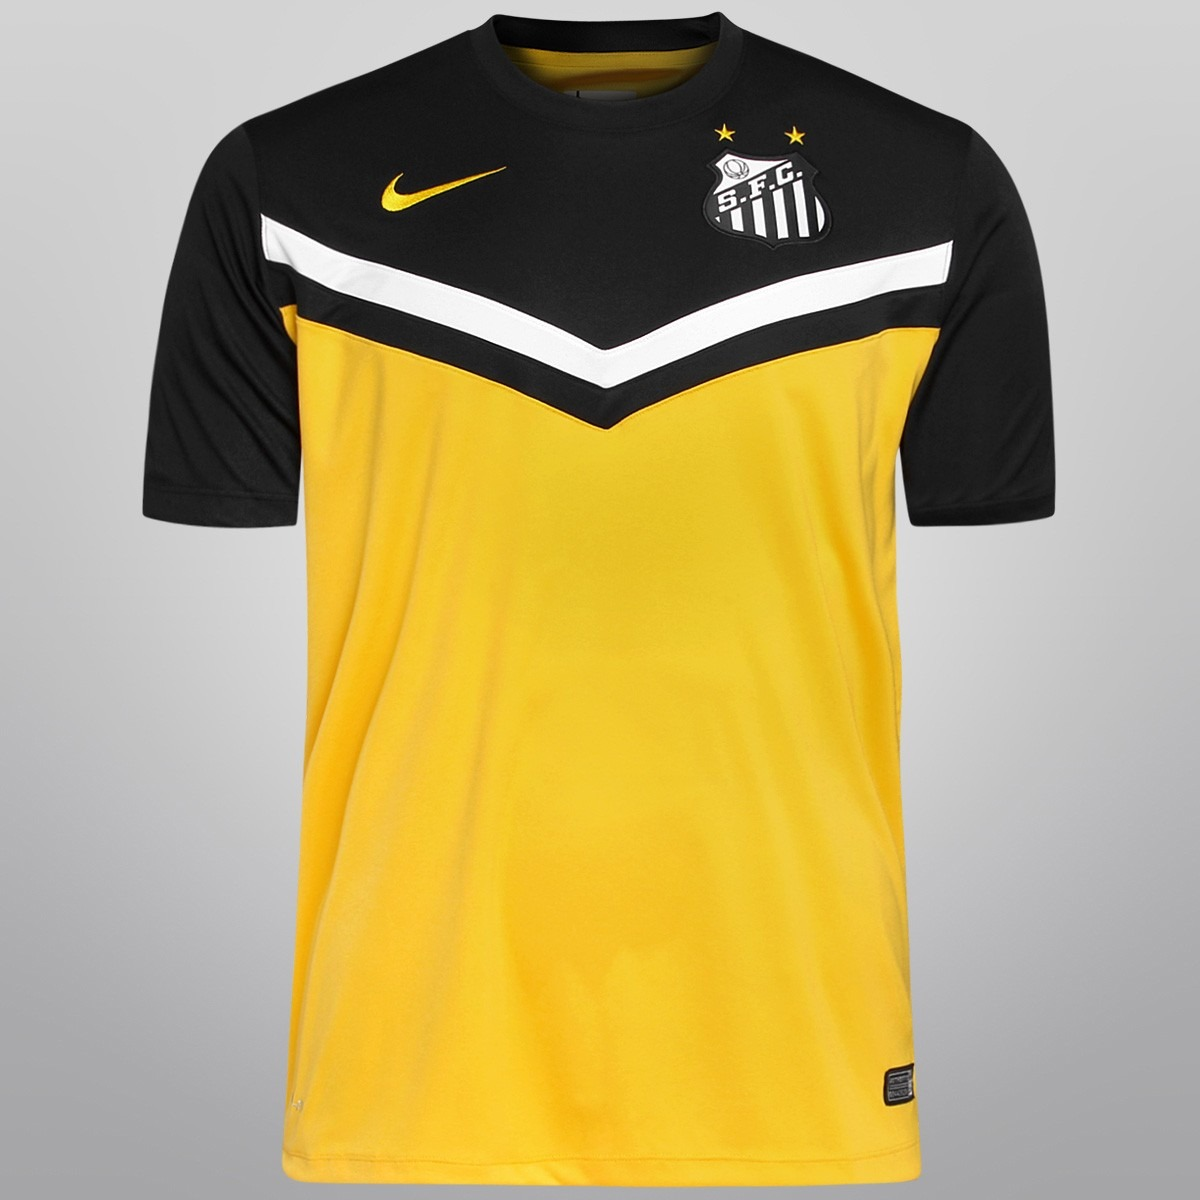 camisa infantil nike santos iii amarela 2014. Carregando zoom. 231652964c64c